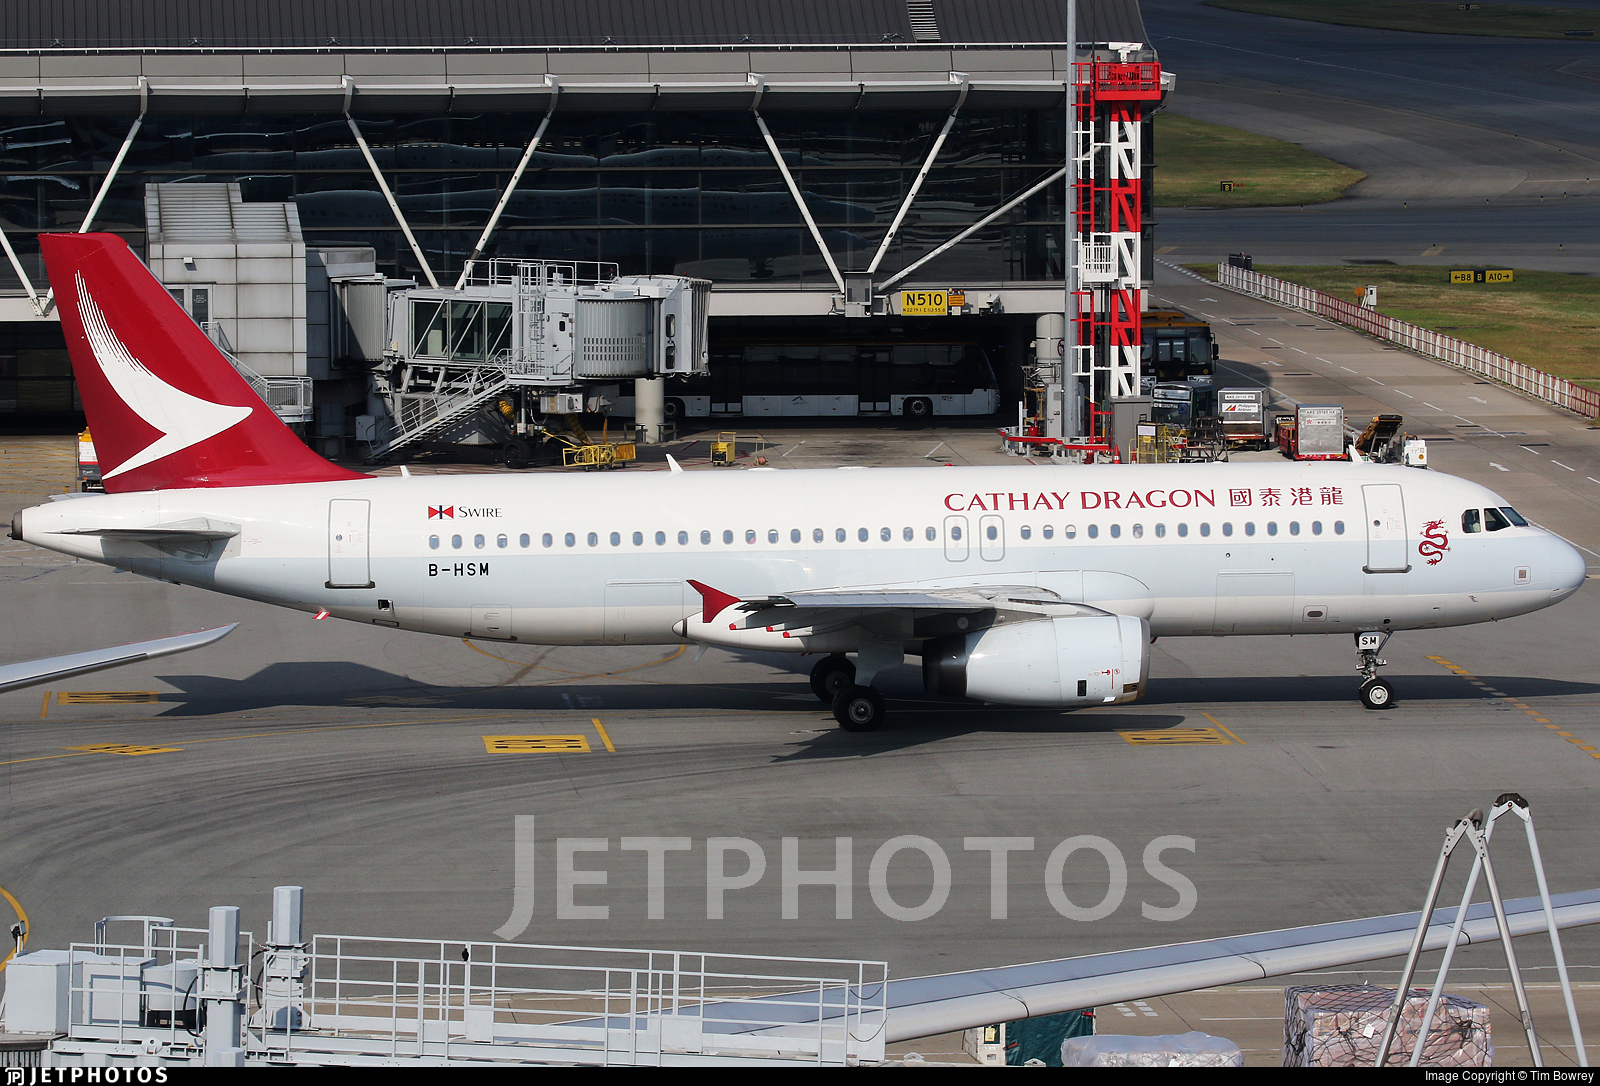 B-HSM - Airbus A320-232 - Cathay Dragon